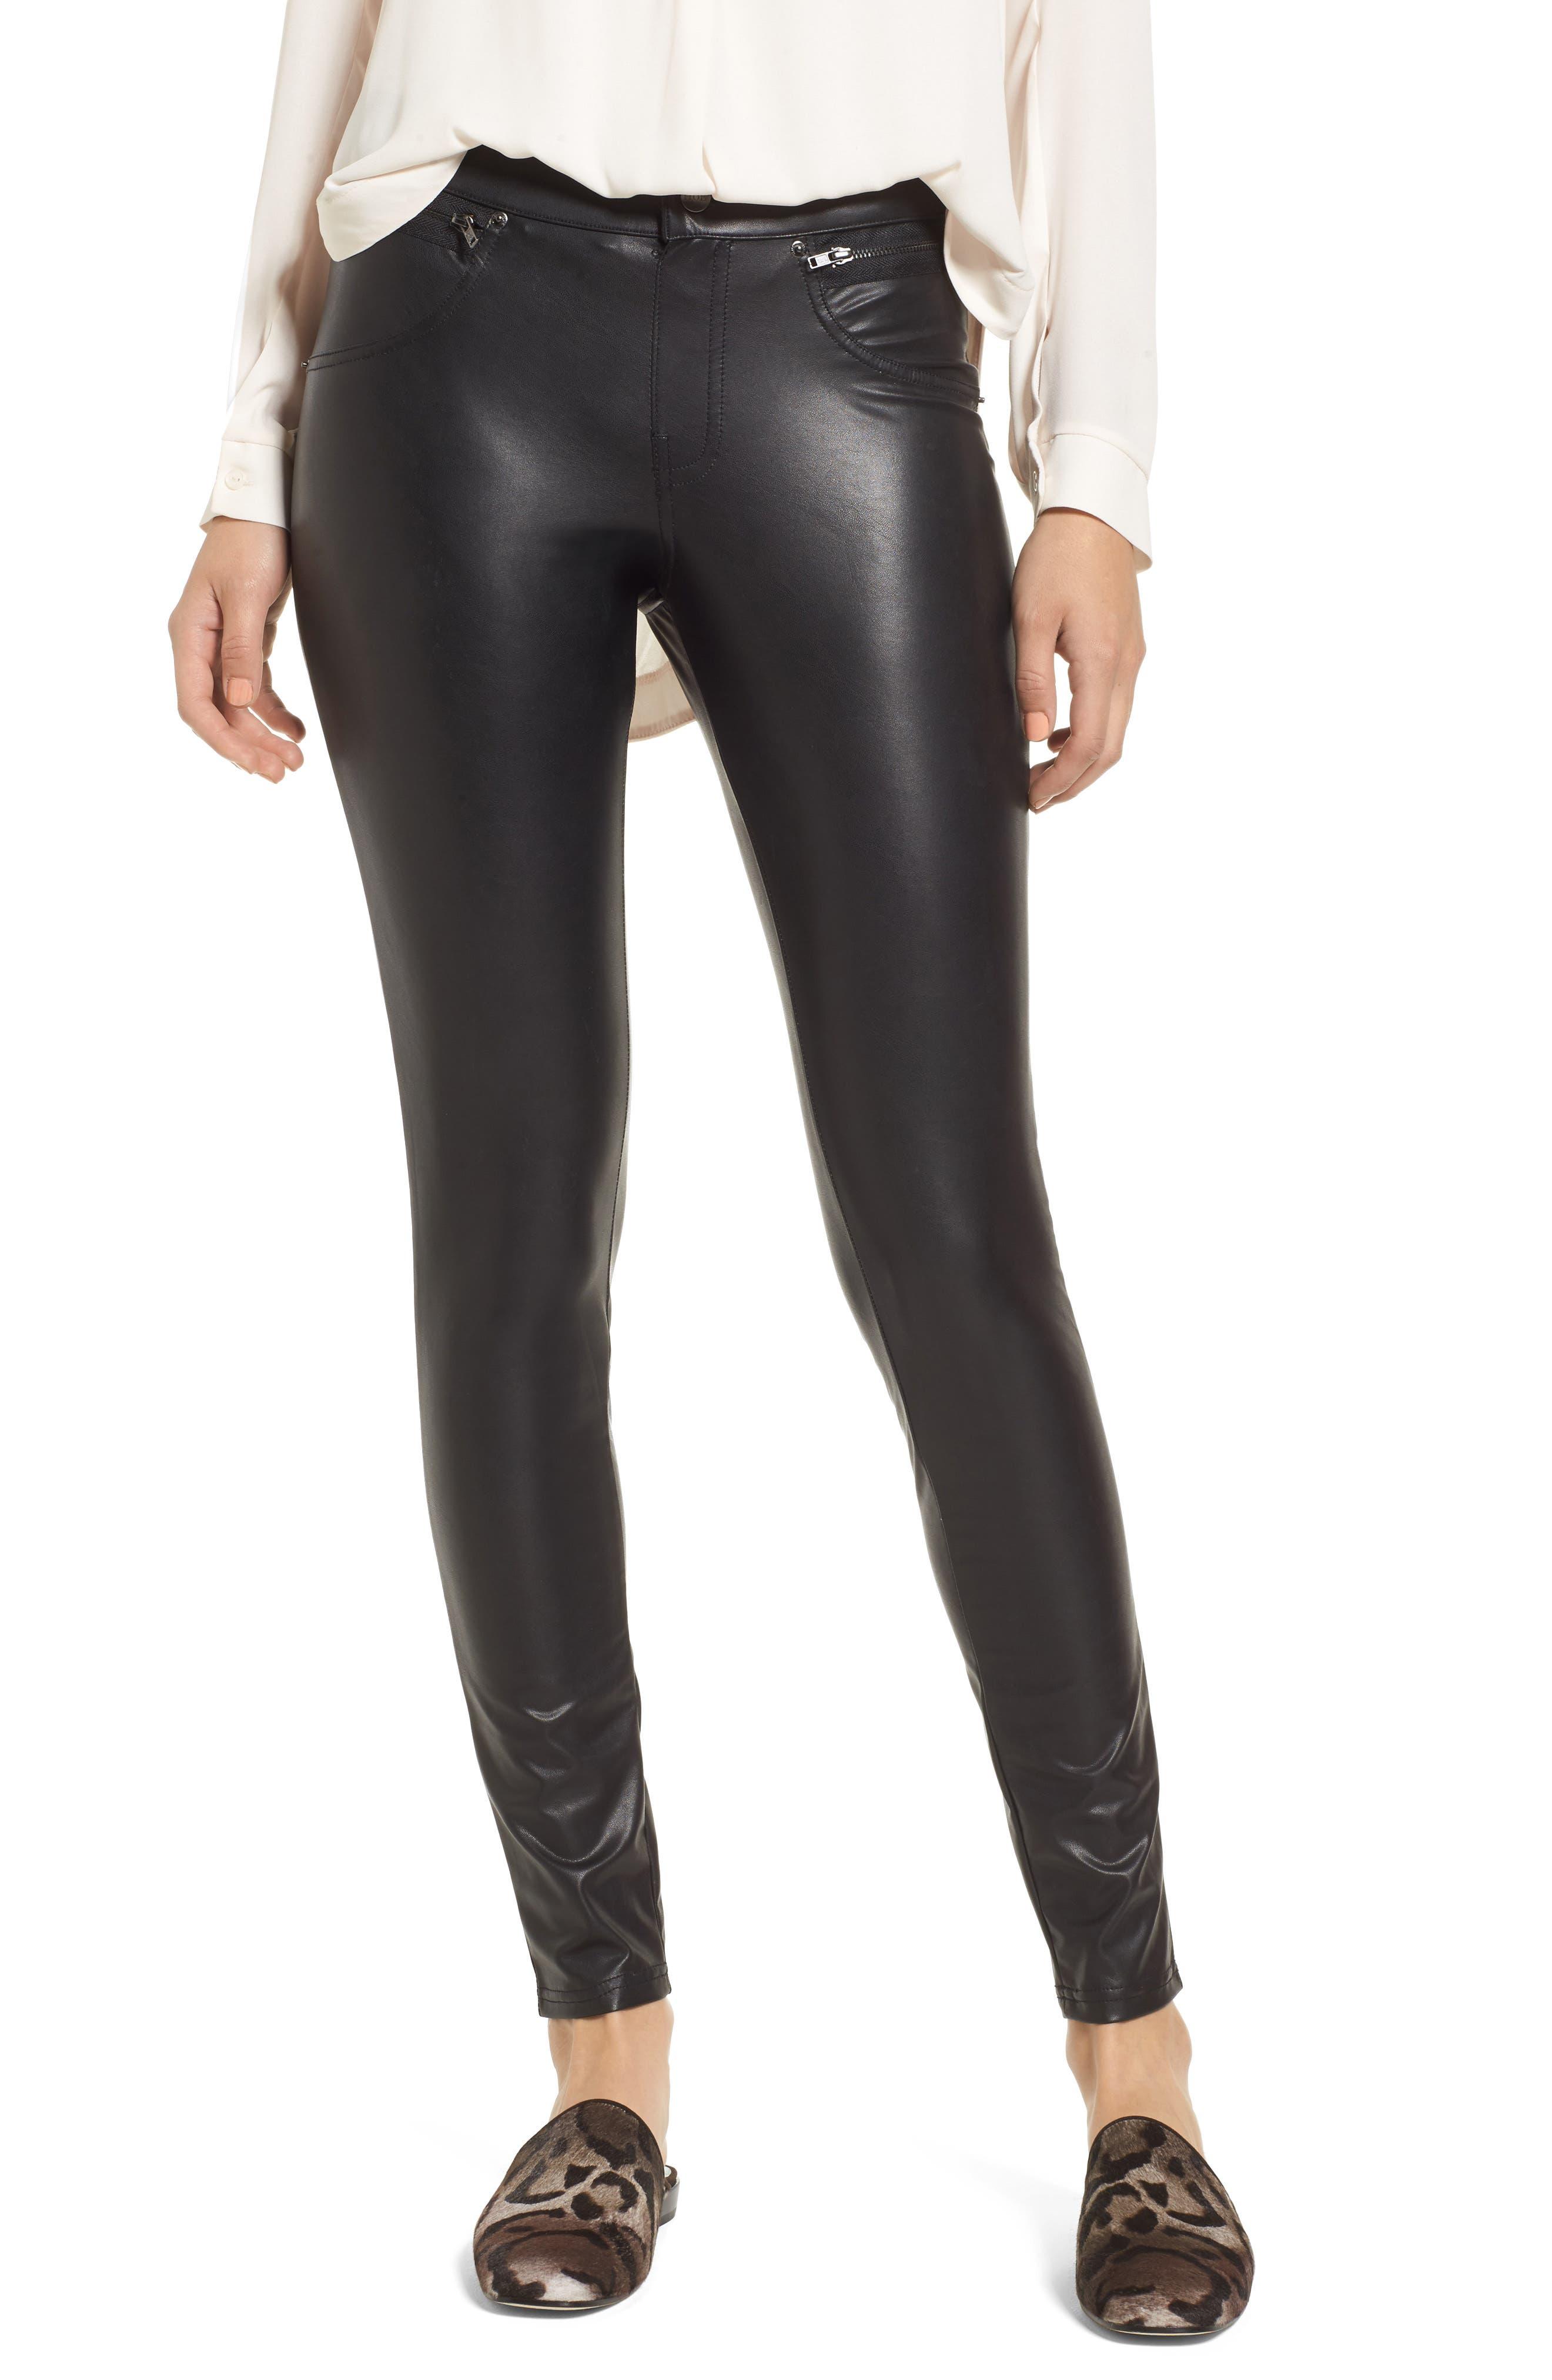 HUE Leatherette Leggings, Main, color, 001